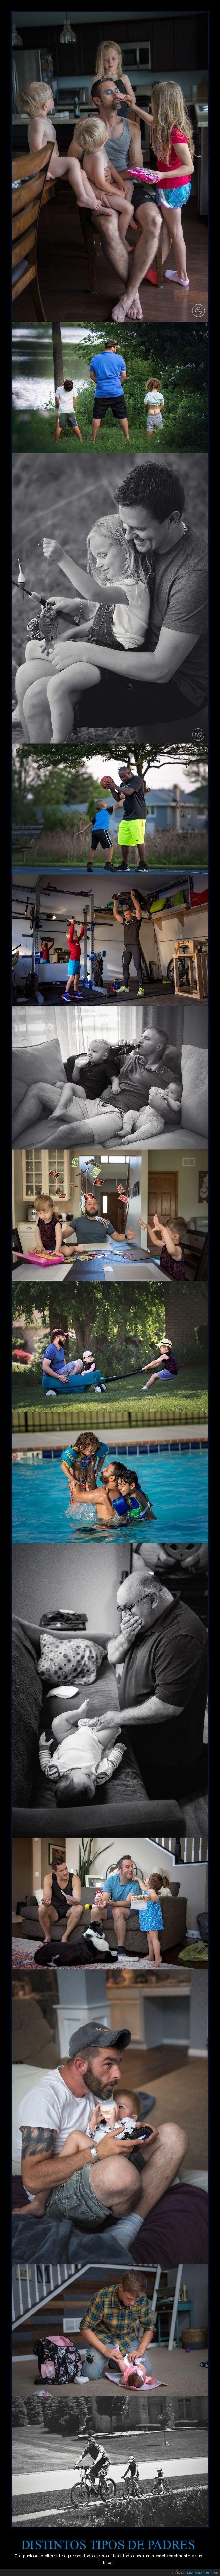 hijos,padres,tipos